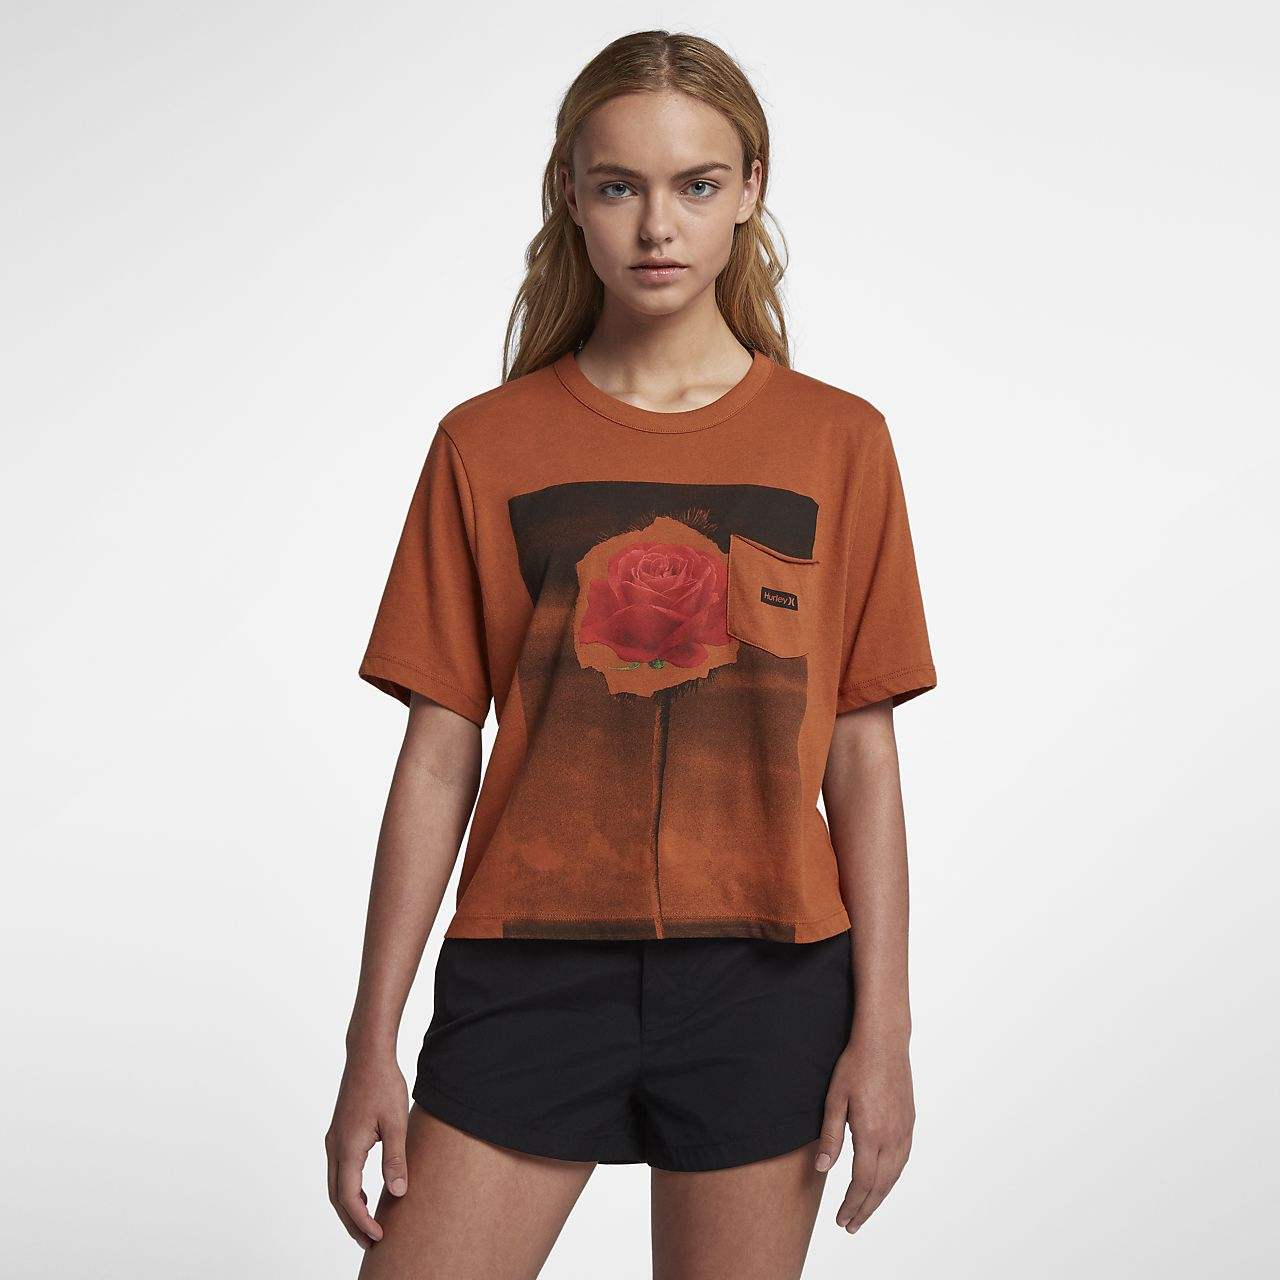 Hurley Rosepalm Crop Perfect Crew Women's T-Shirt